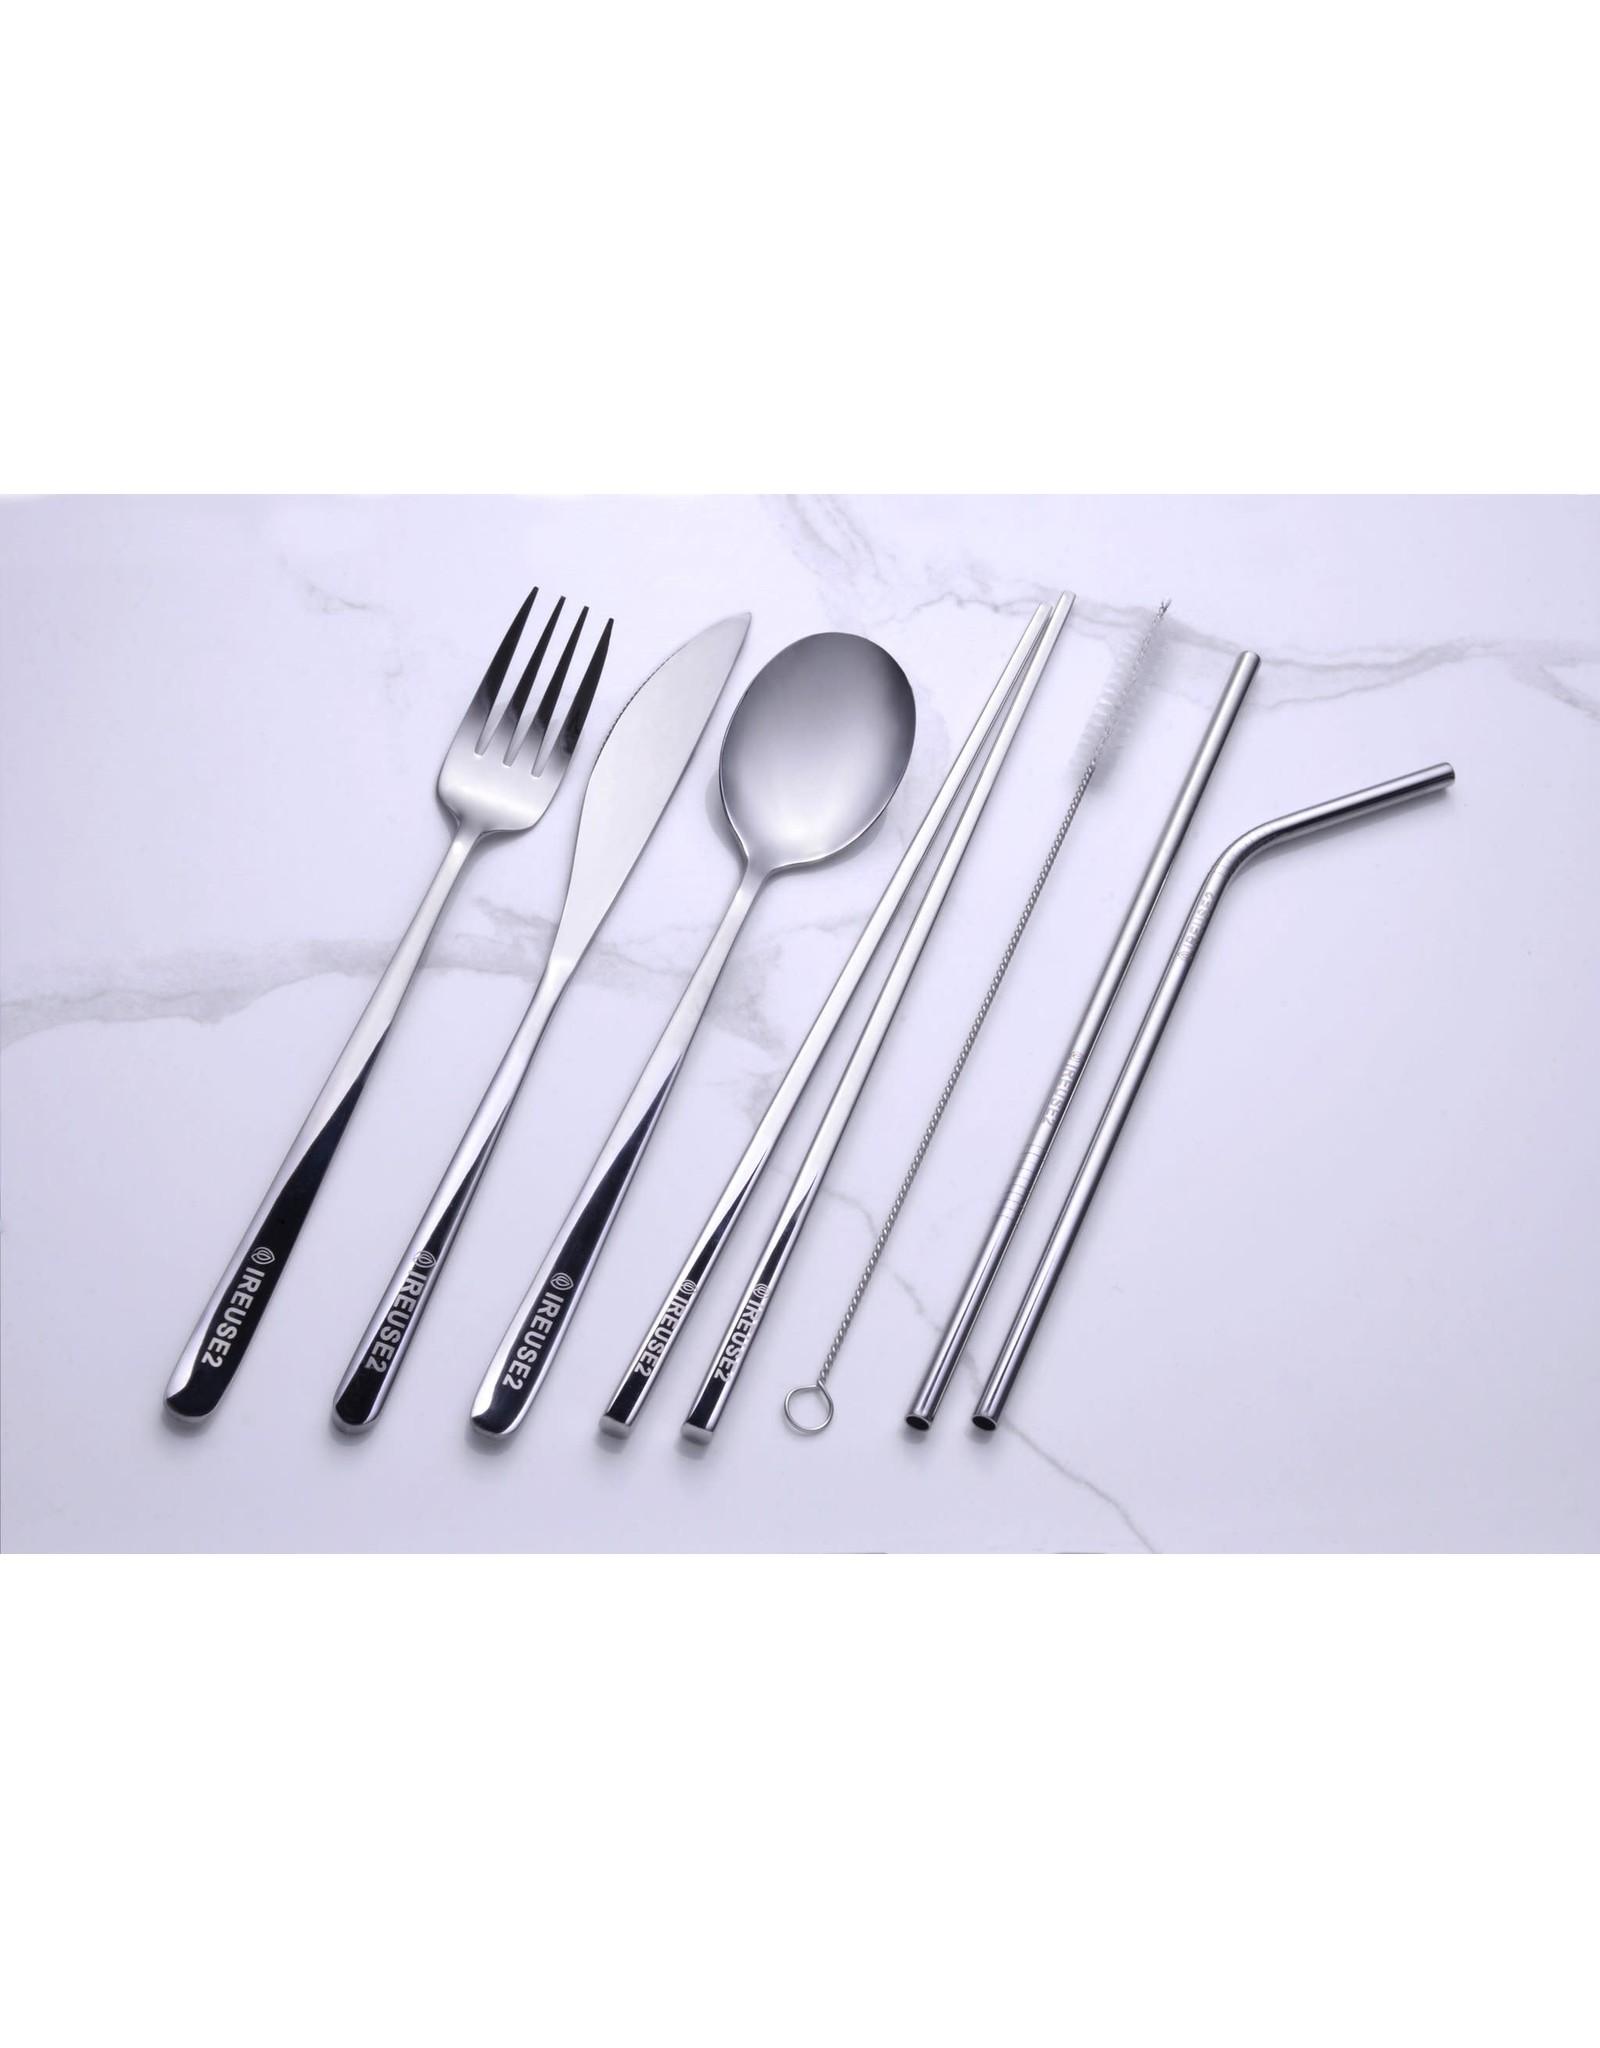 ireuse2 Premium Reusable Cutlery Set - Adult